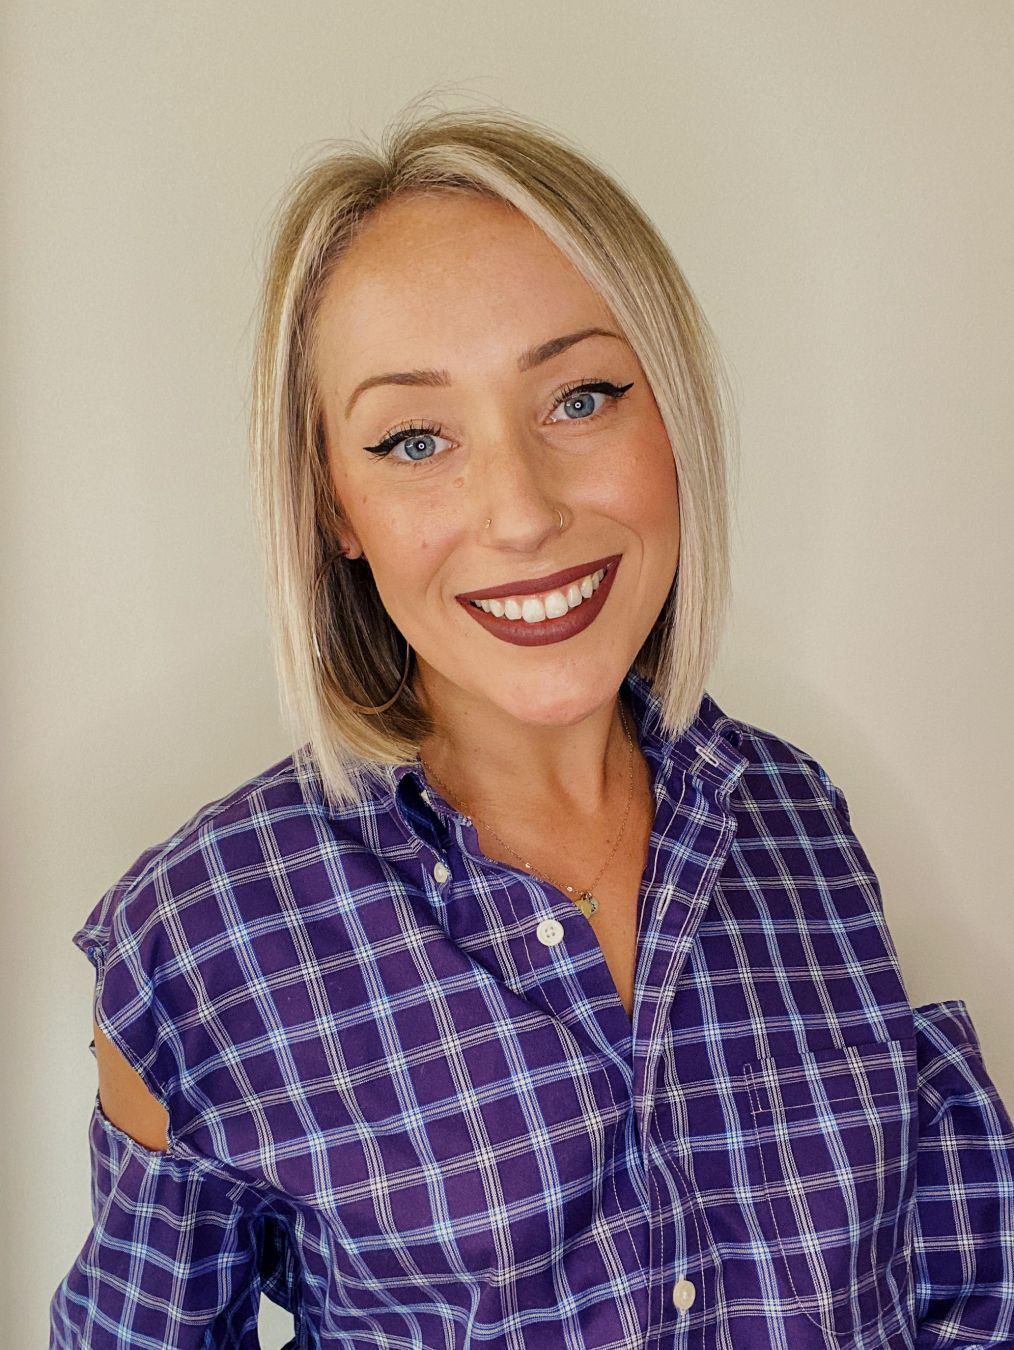 Alli Burkett - Senior Account Manager